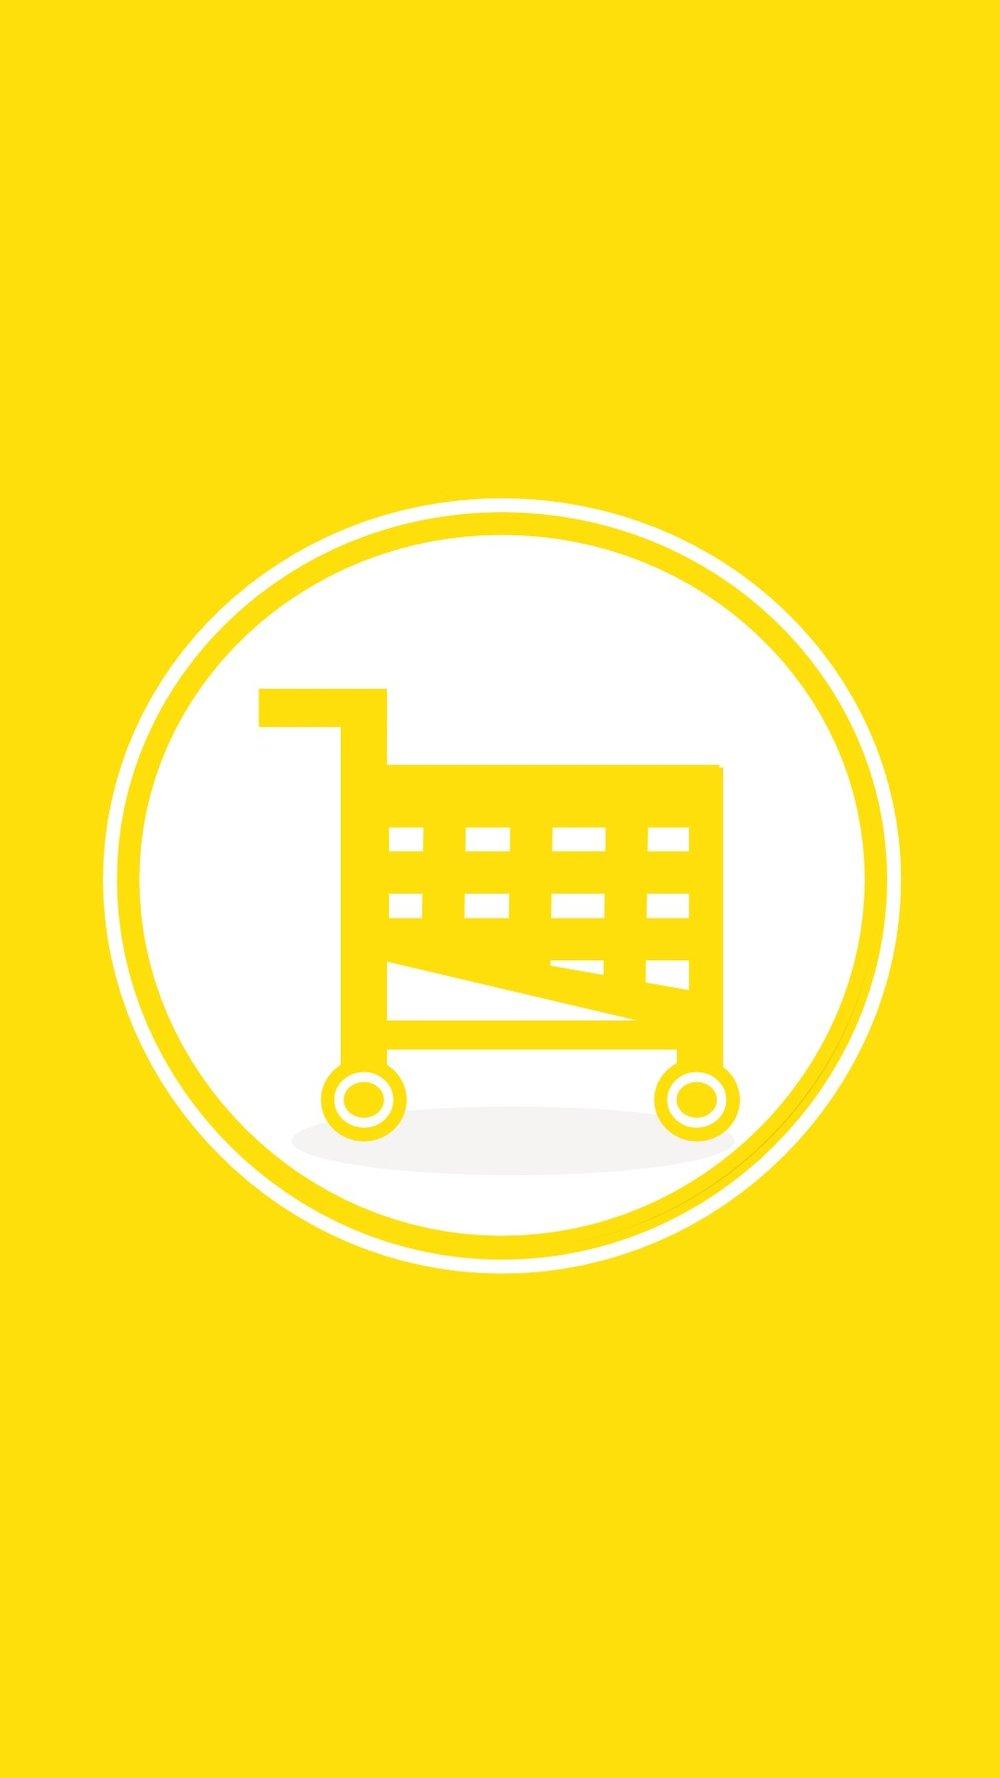 Insta-cover-shoppingcar-yellow-madebylottyvargas-lotnotes.jpg